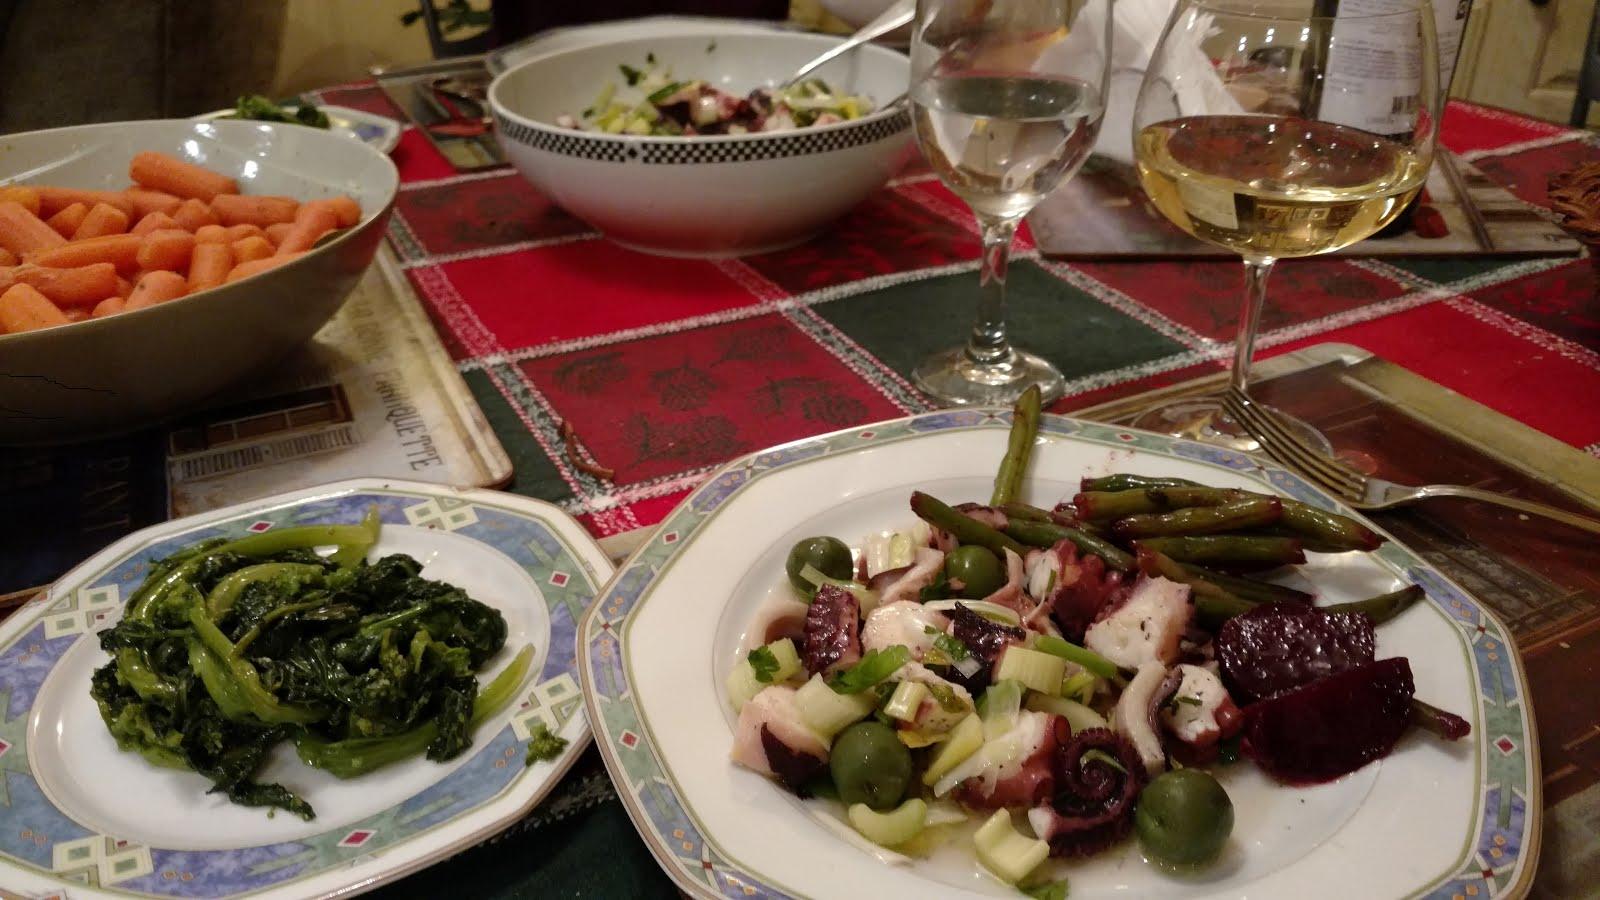 Octopus Salad with beets 'n beans, broccoli di rape, & carrots lemony.